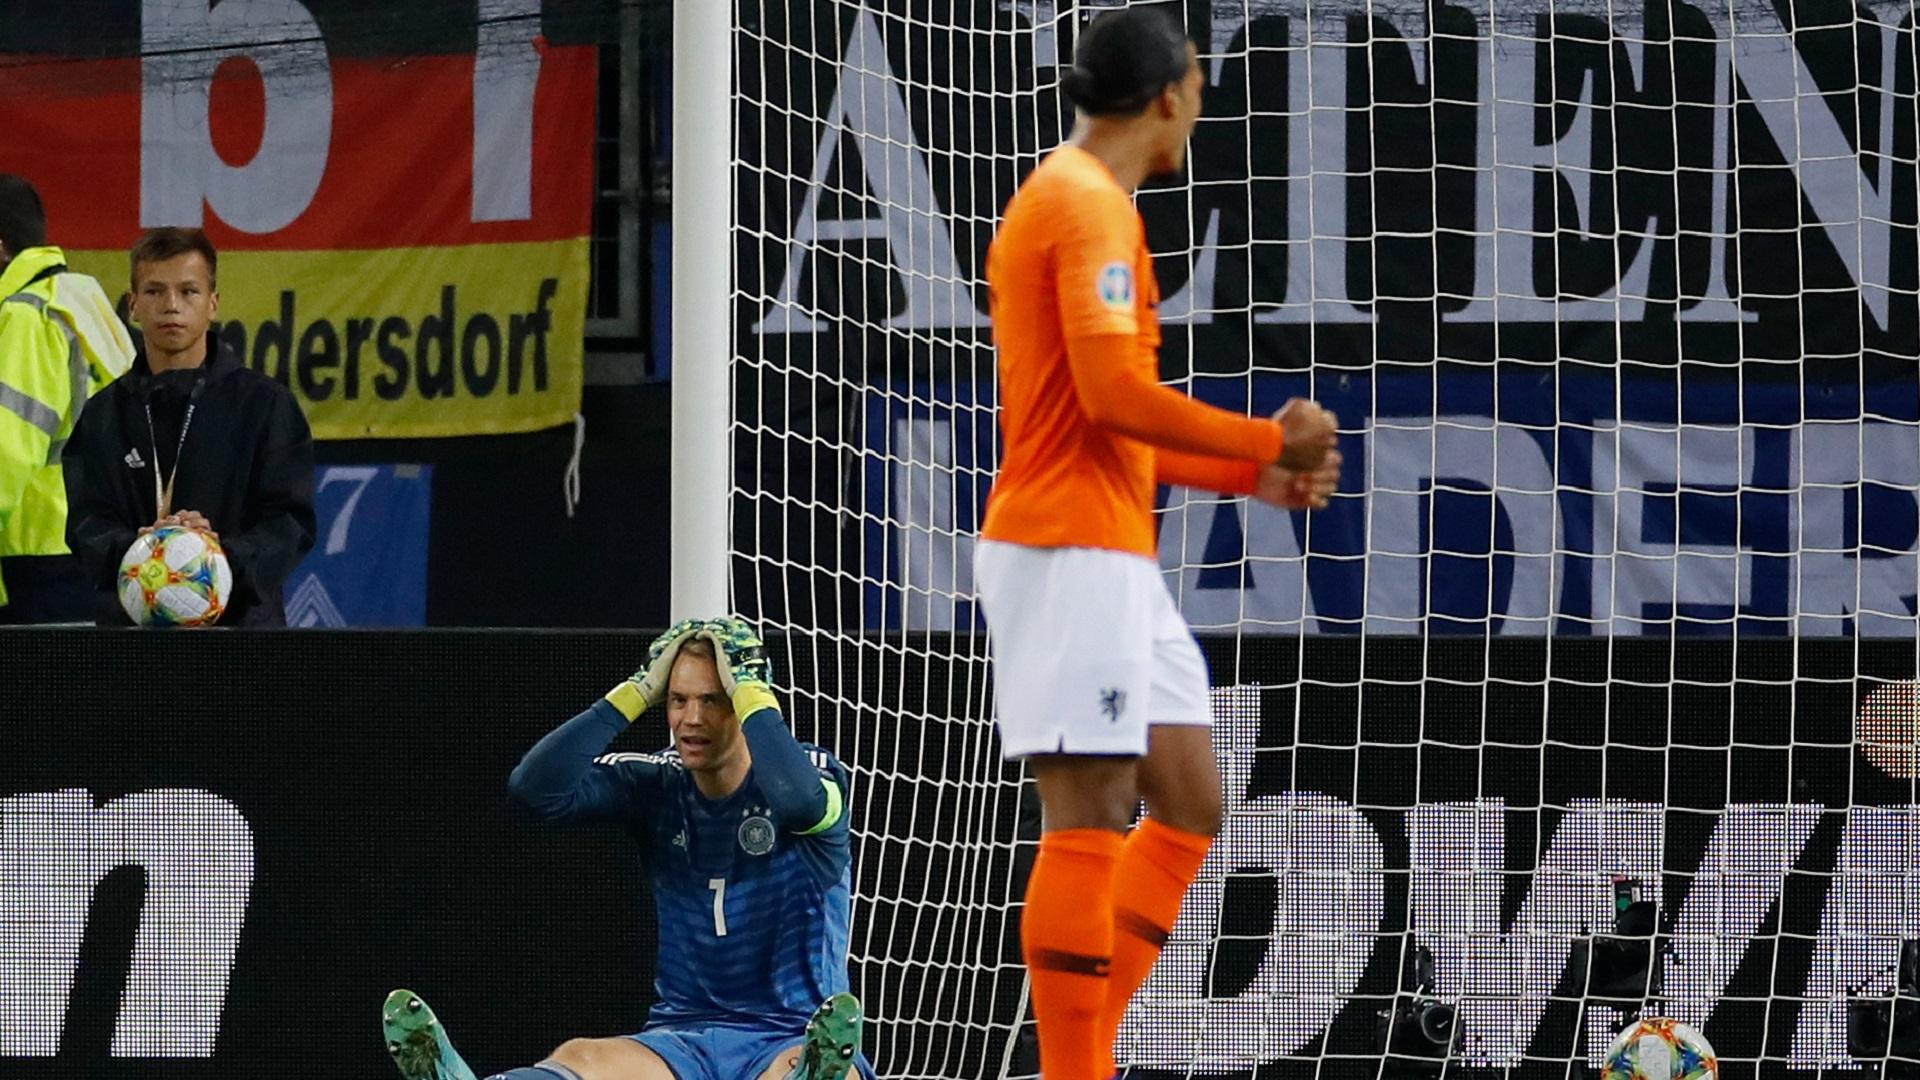 Man City midfielder Gundogan leaves Germany camp with illness ahead of crucial Northern Ireland game